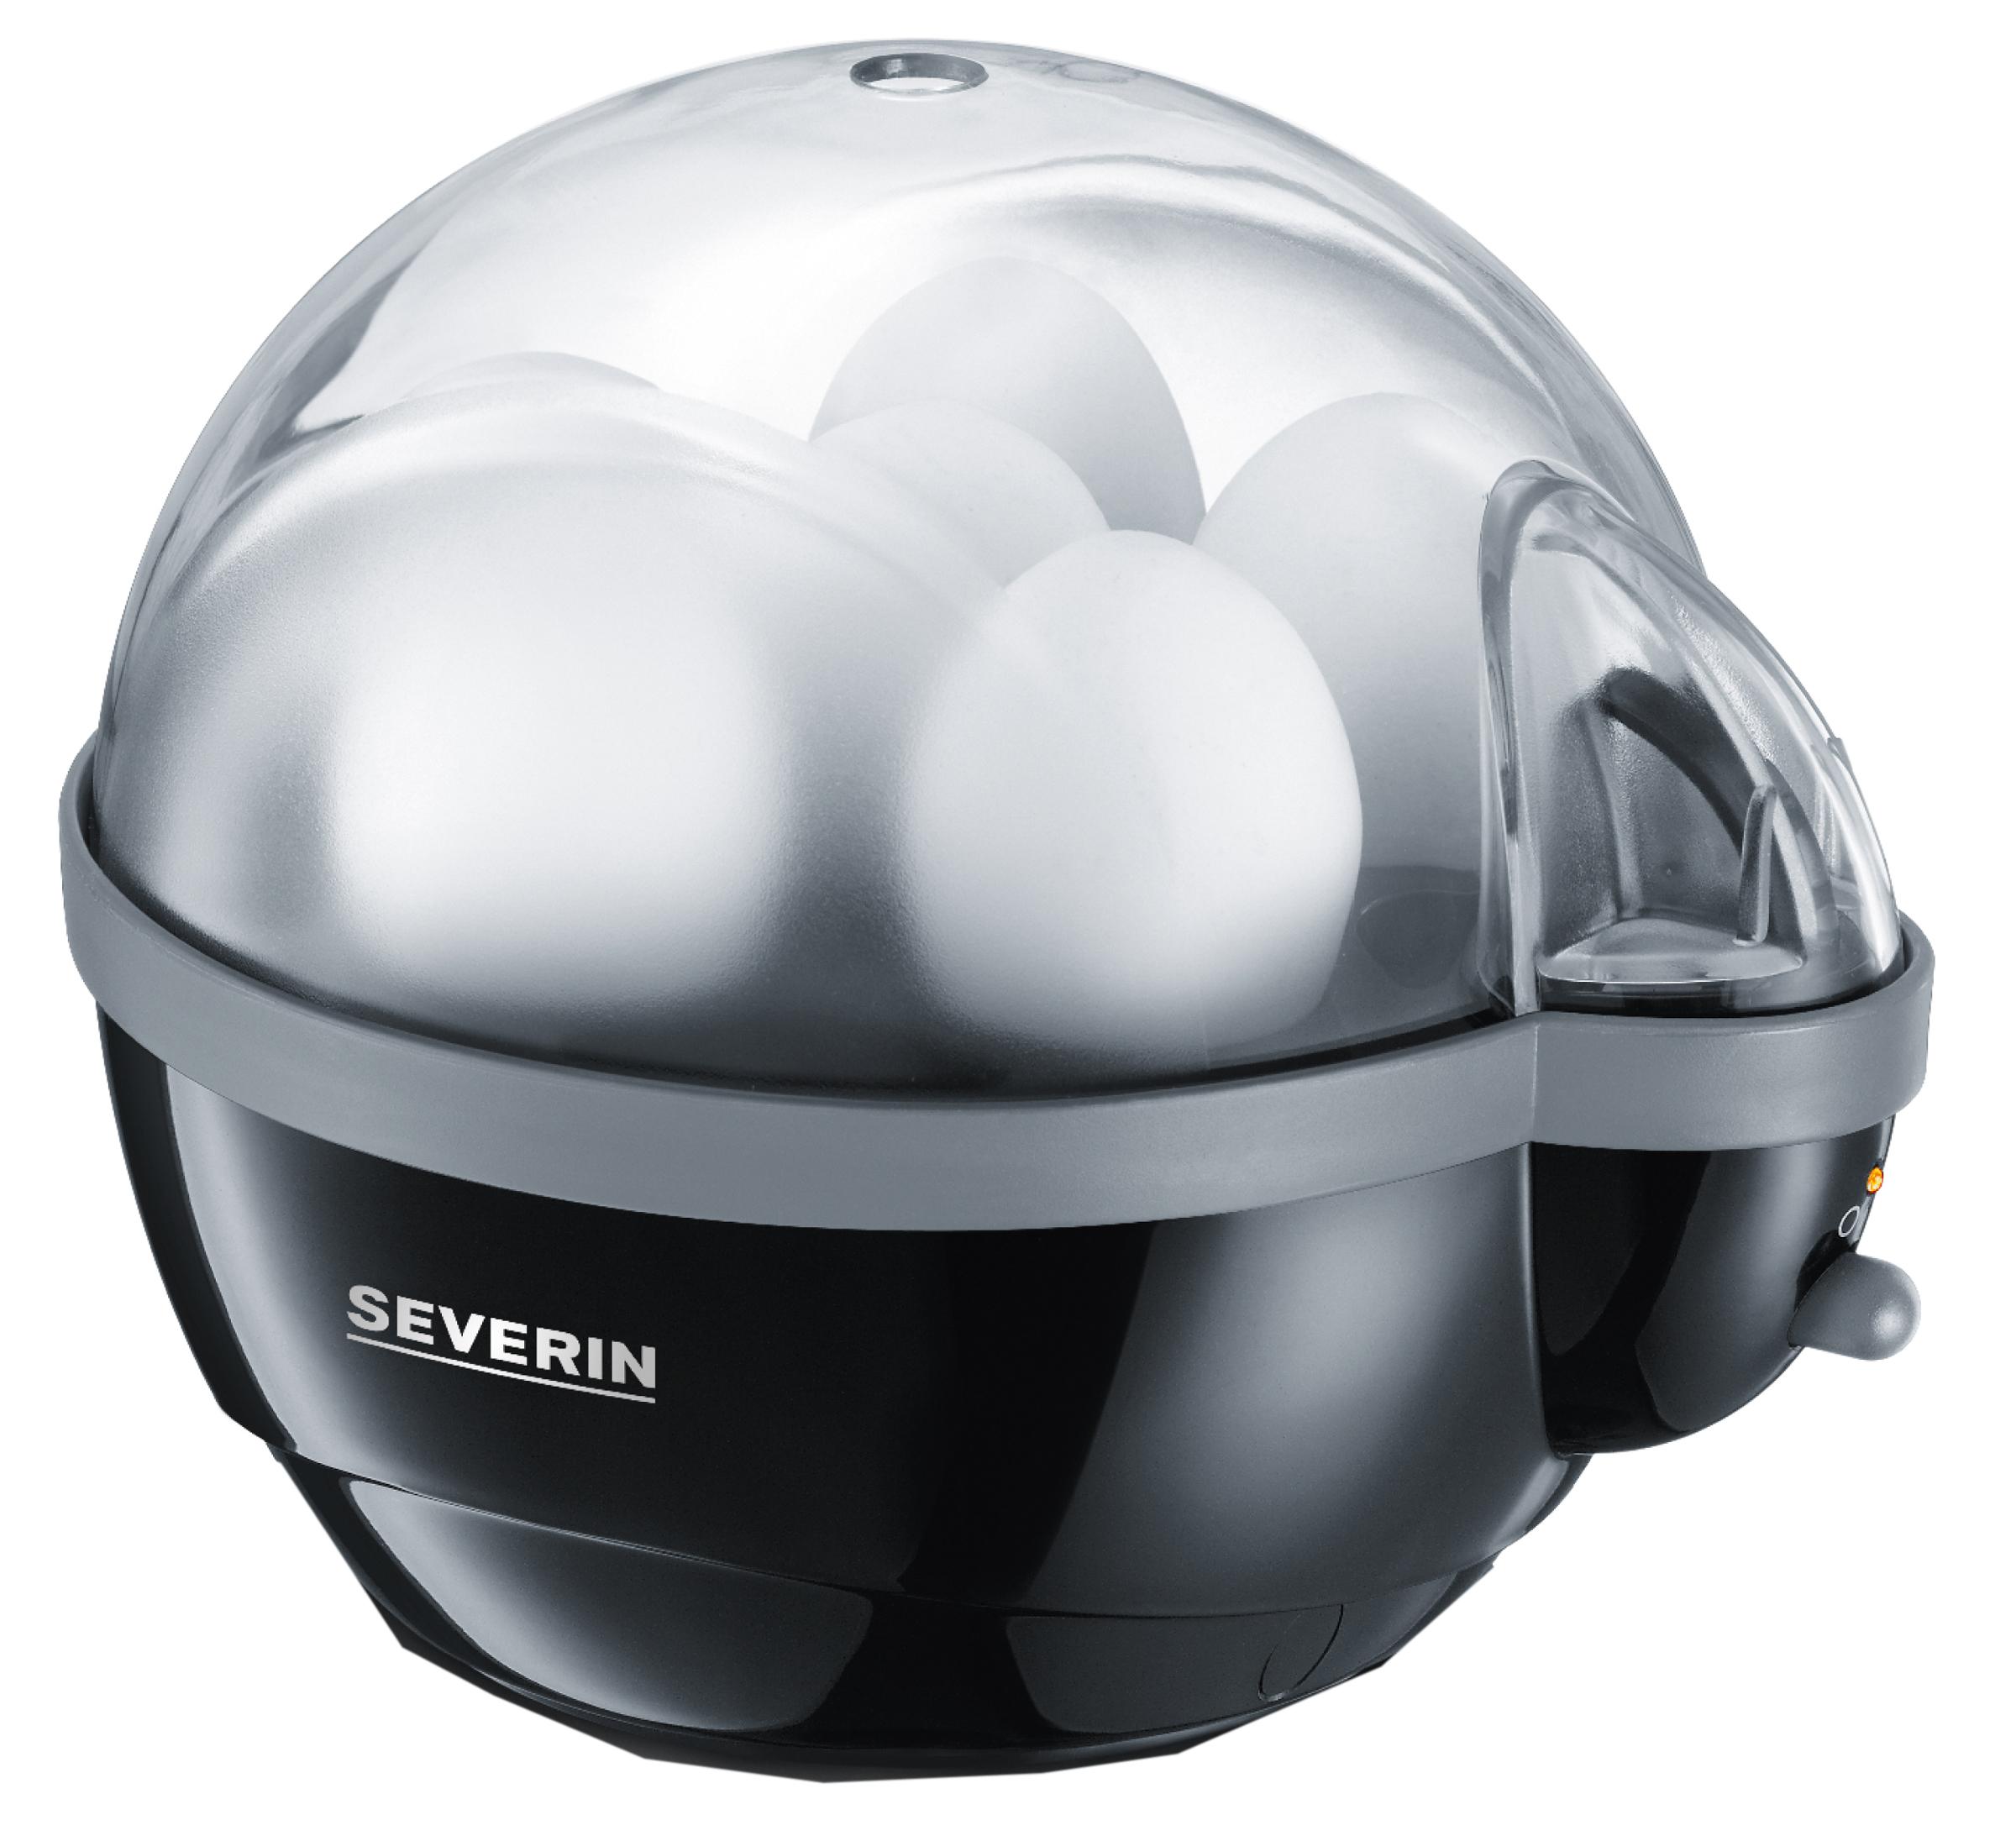 SEVERIN Eierkocher EK 3056, für 6 Eier, schwarz / grau